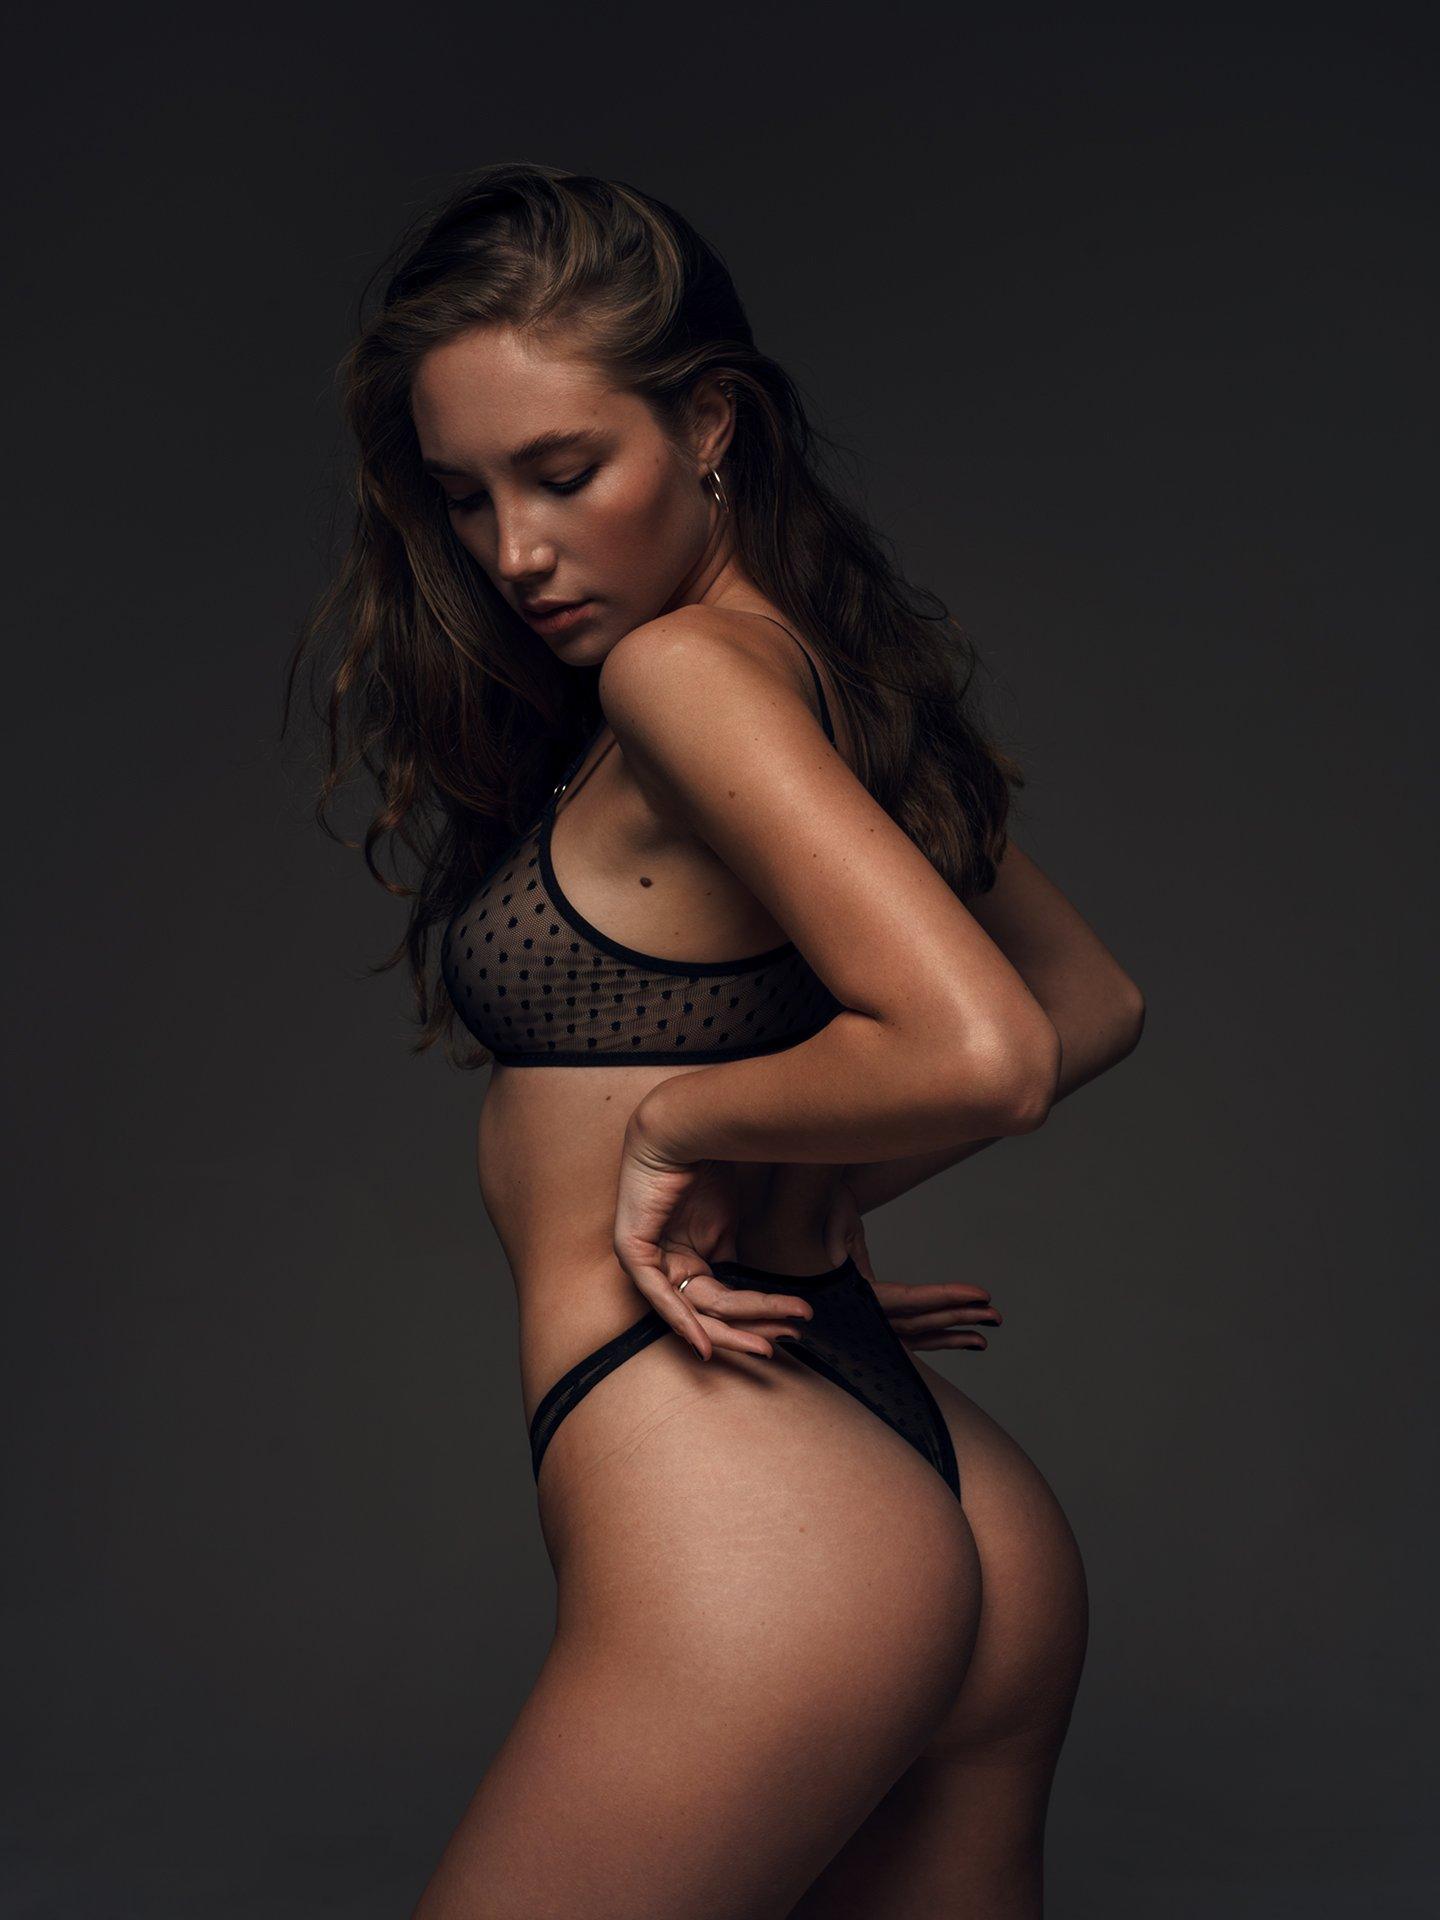 girl, test, studio, Moscow, model, underwear, tone, light, prophoto, Роман Филиппов